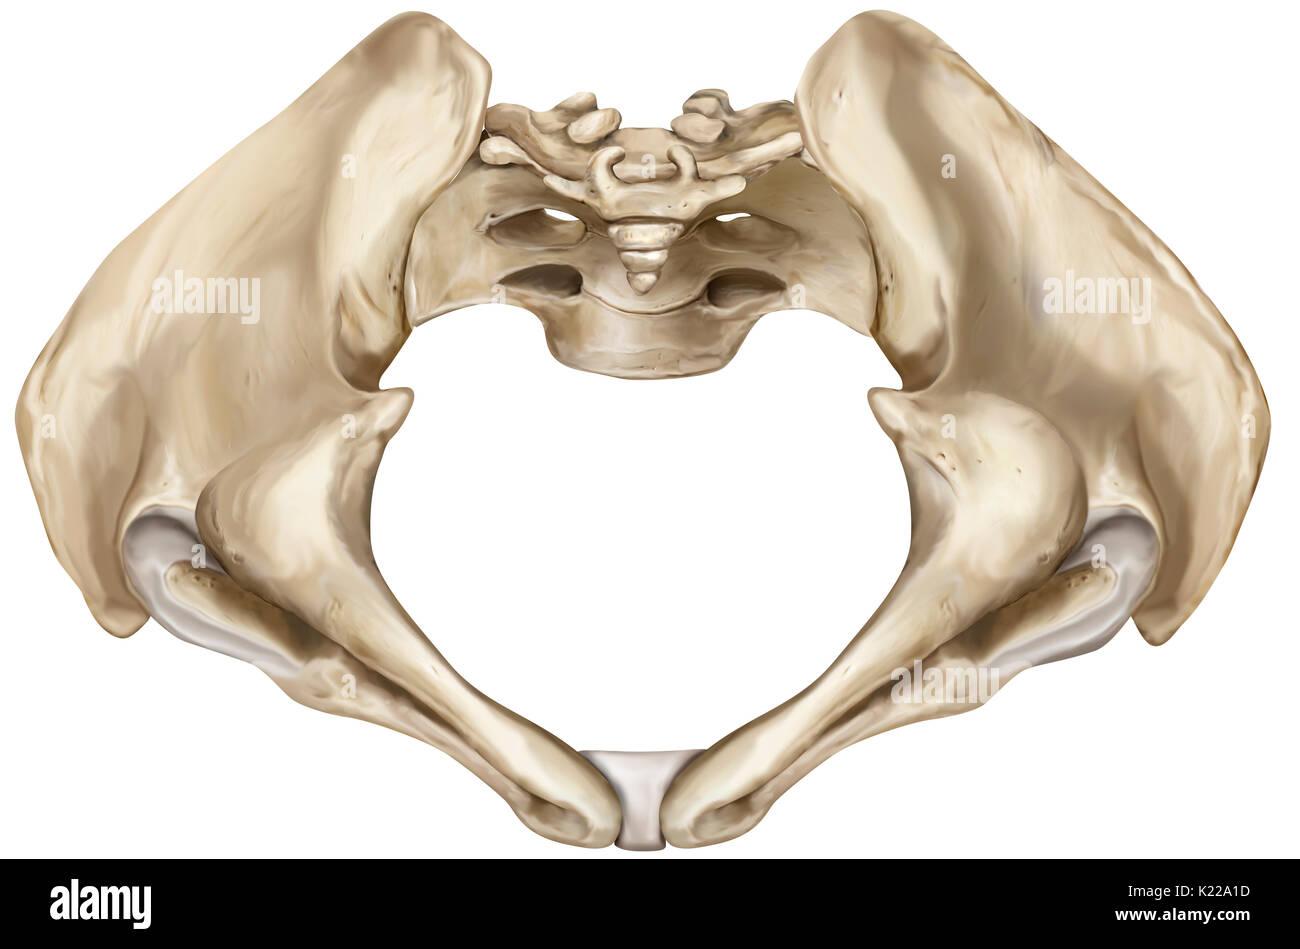 Bony Girdle Consisting Of The Sacrum Coccyx And Two Iliac Bones